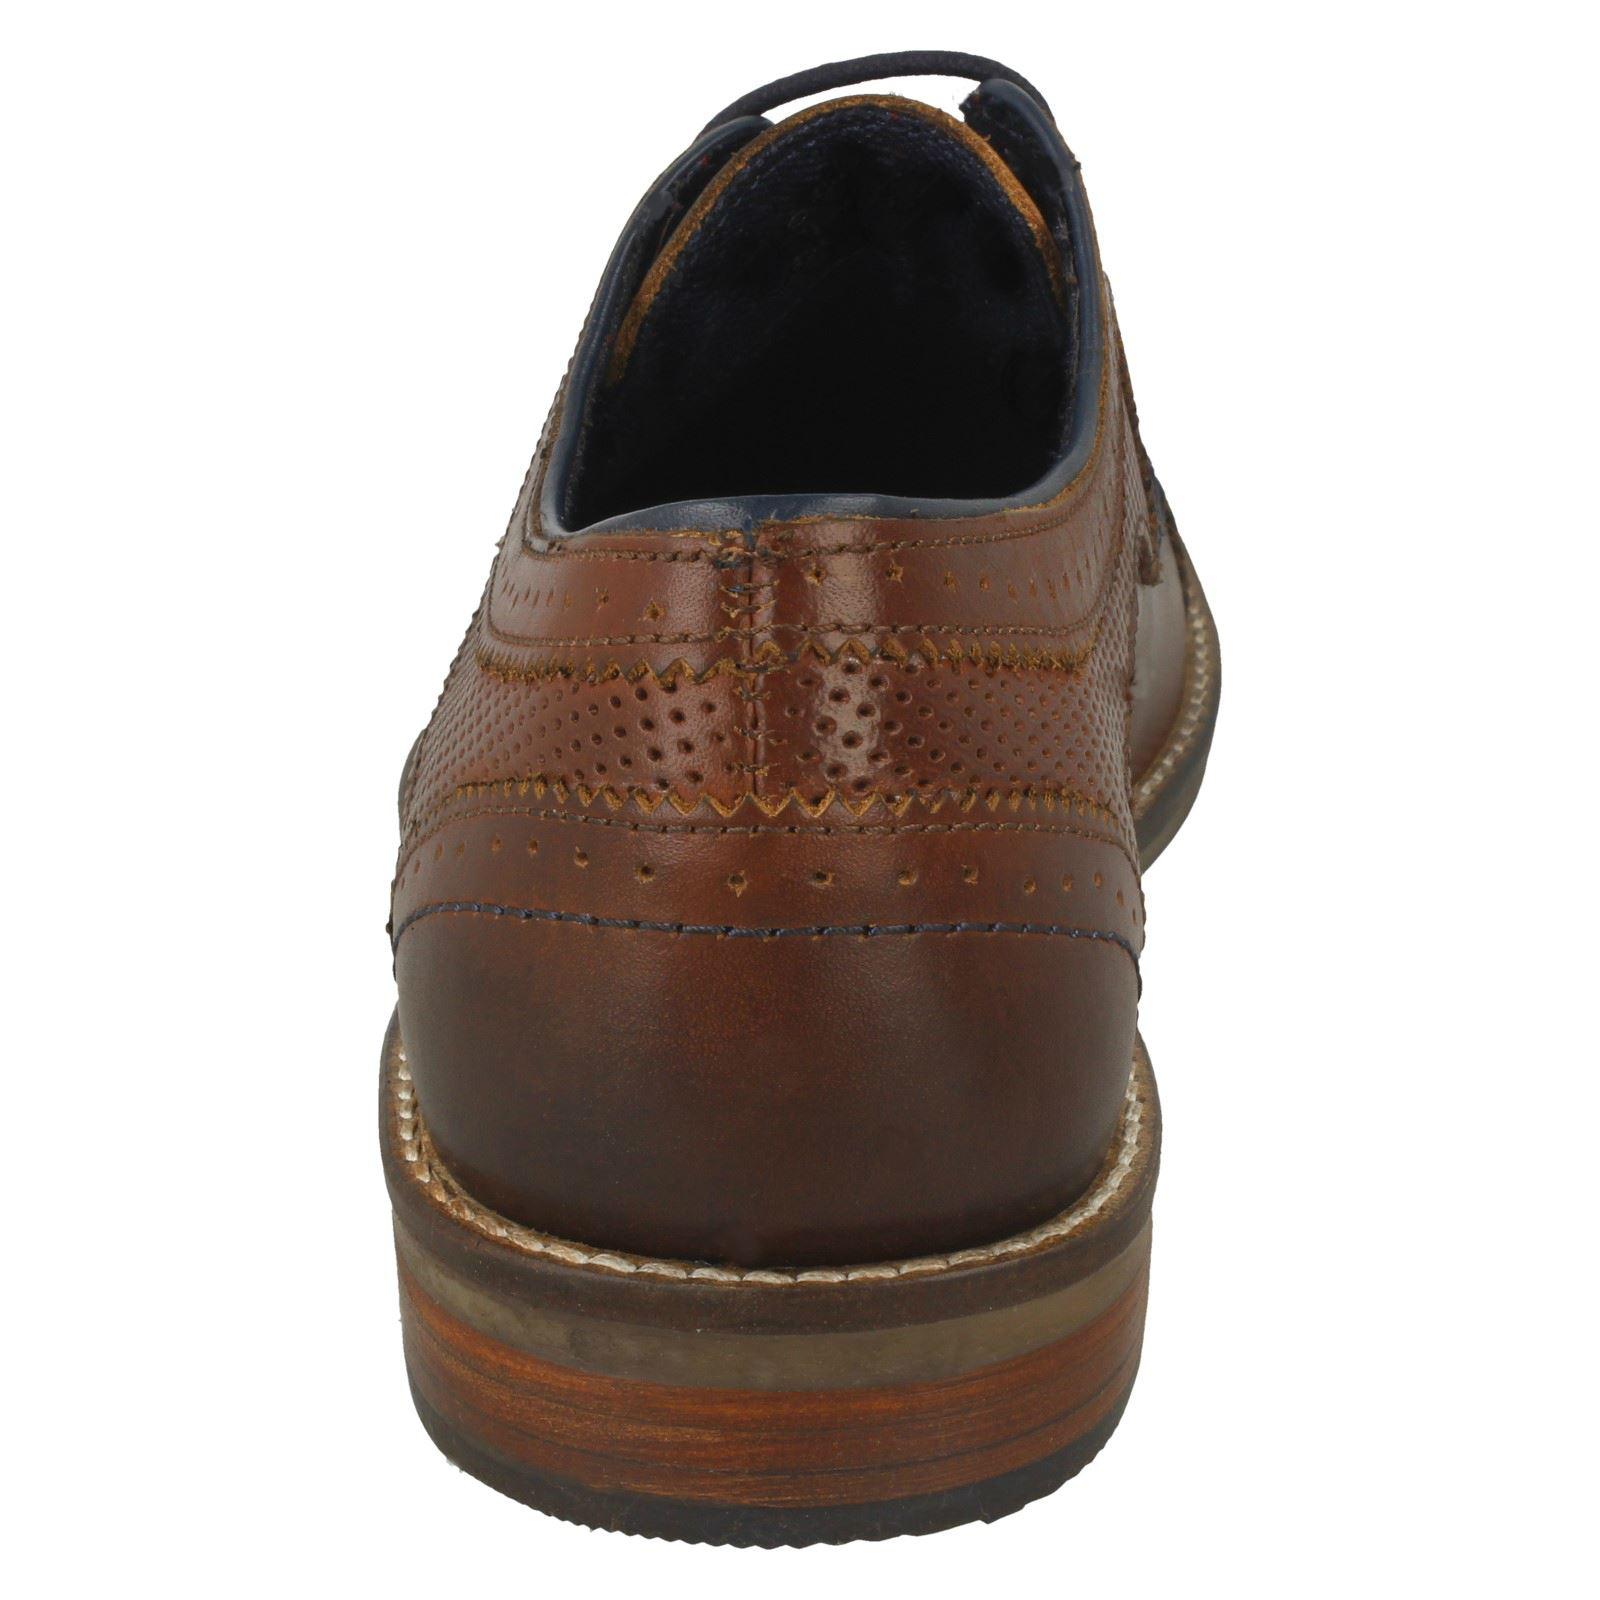 Mens POD Laced Up Shoe Montana